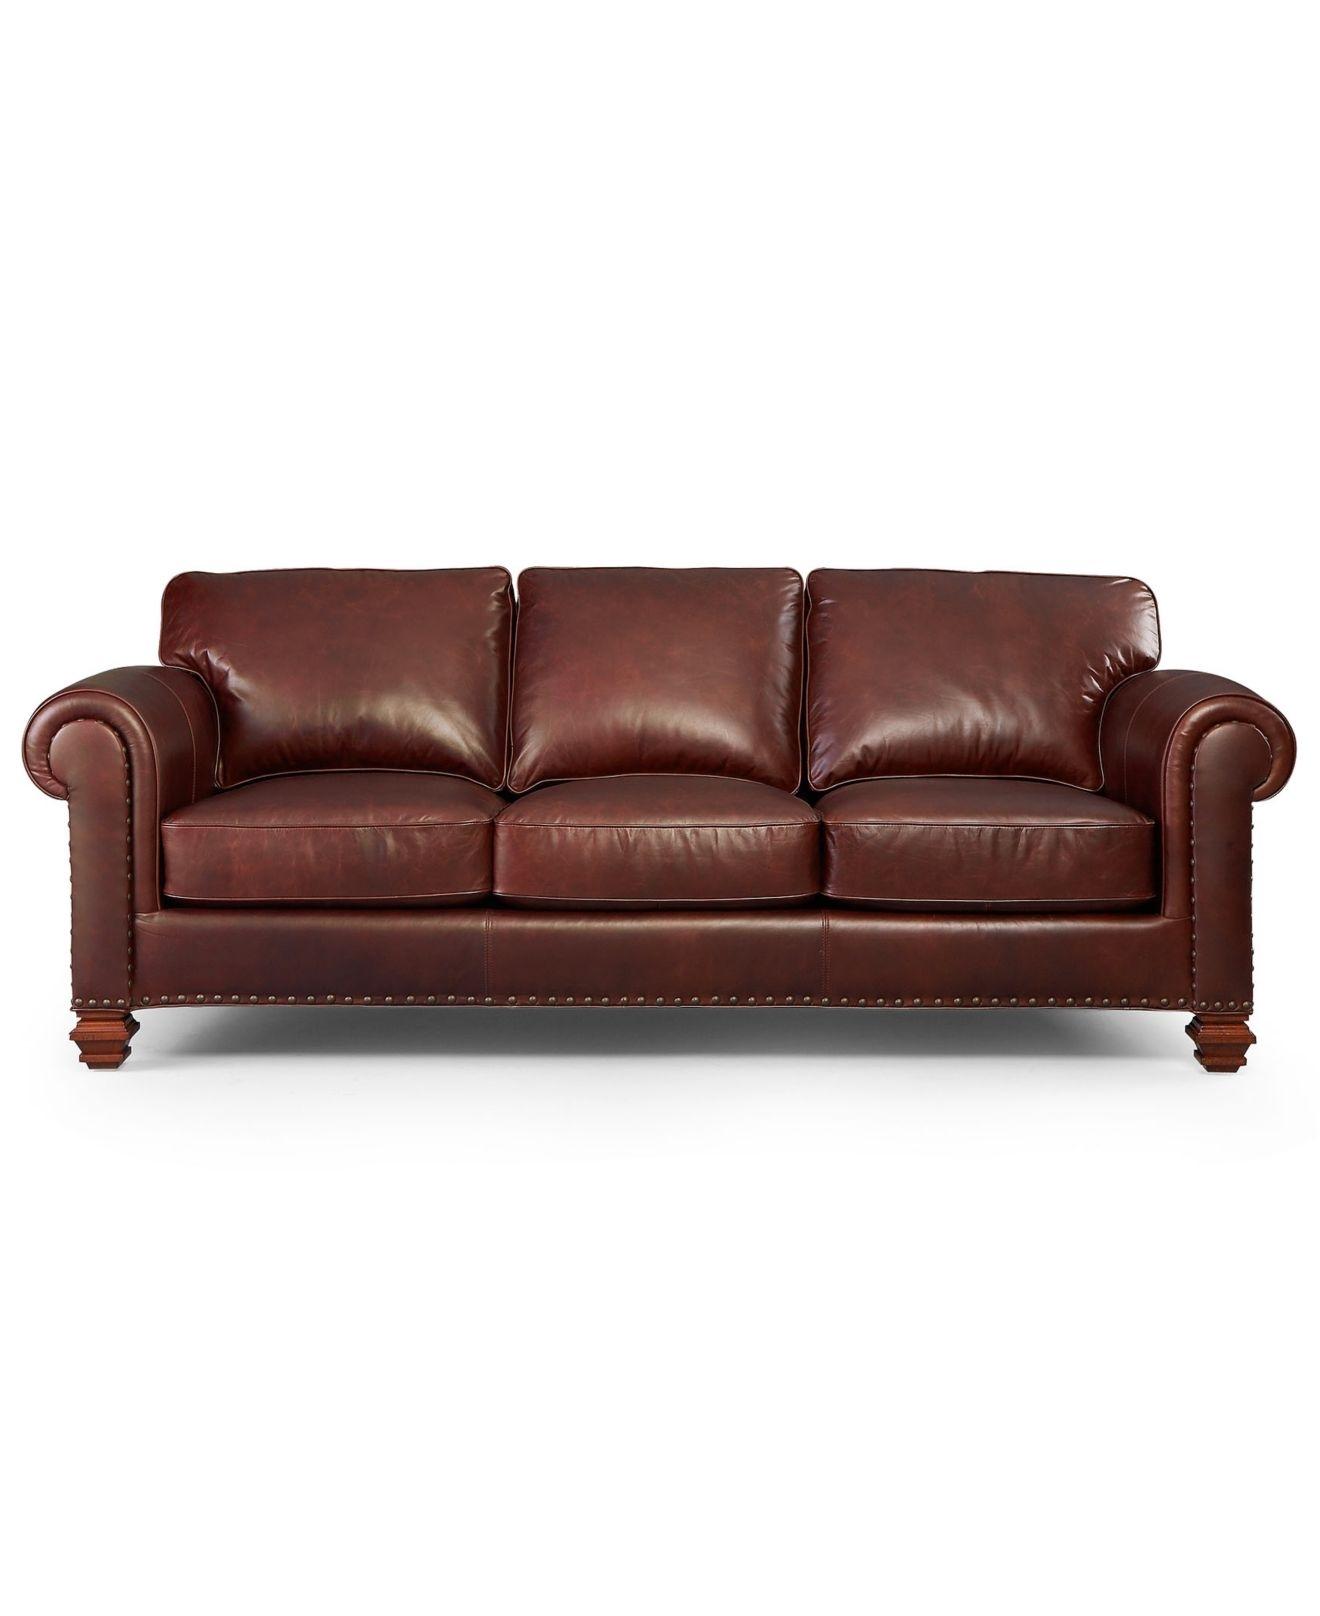 Lauren Ralph Lauren Leather Sofa, Stanmore – Living Room Furniture In Macys Leather Sofas (View 10 of 10)